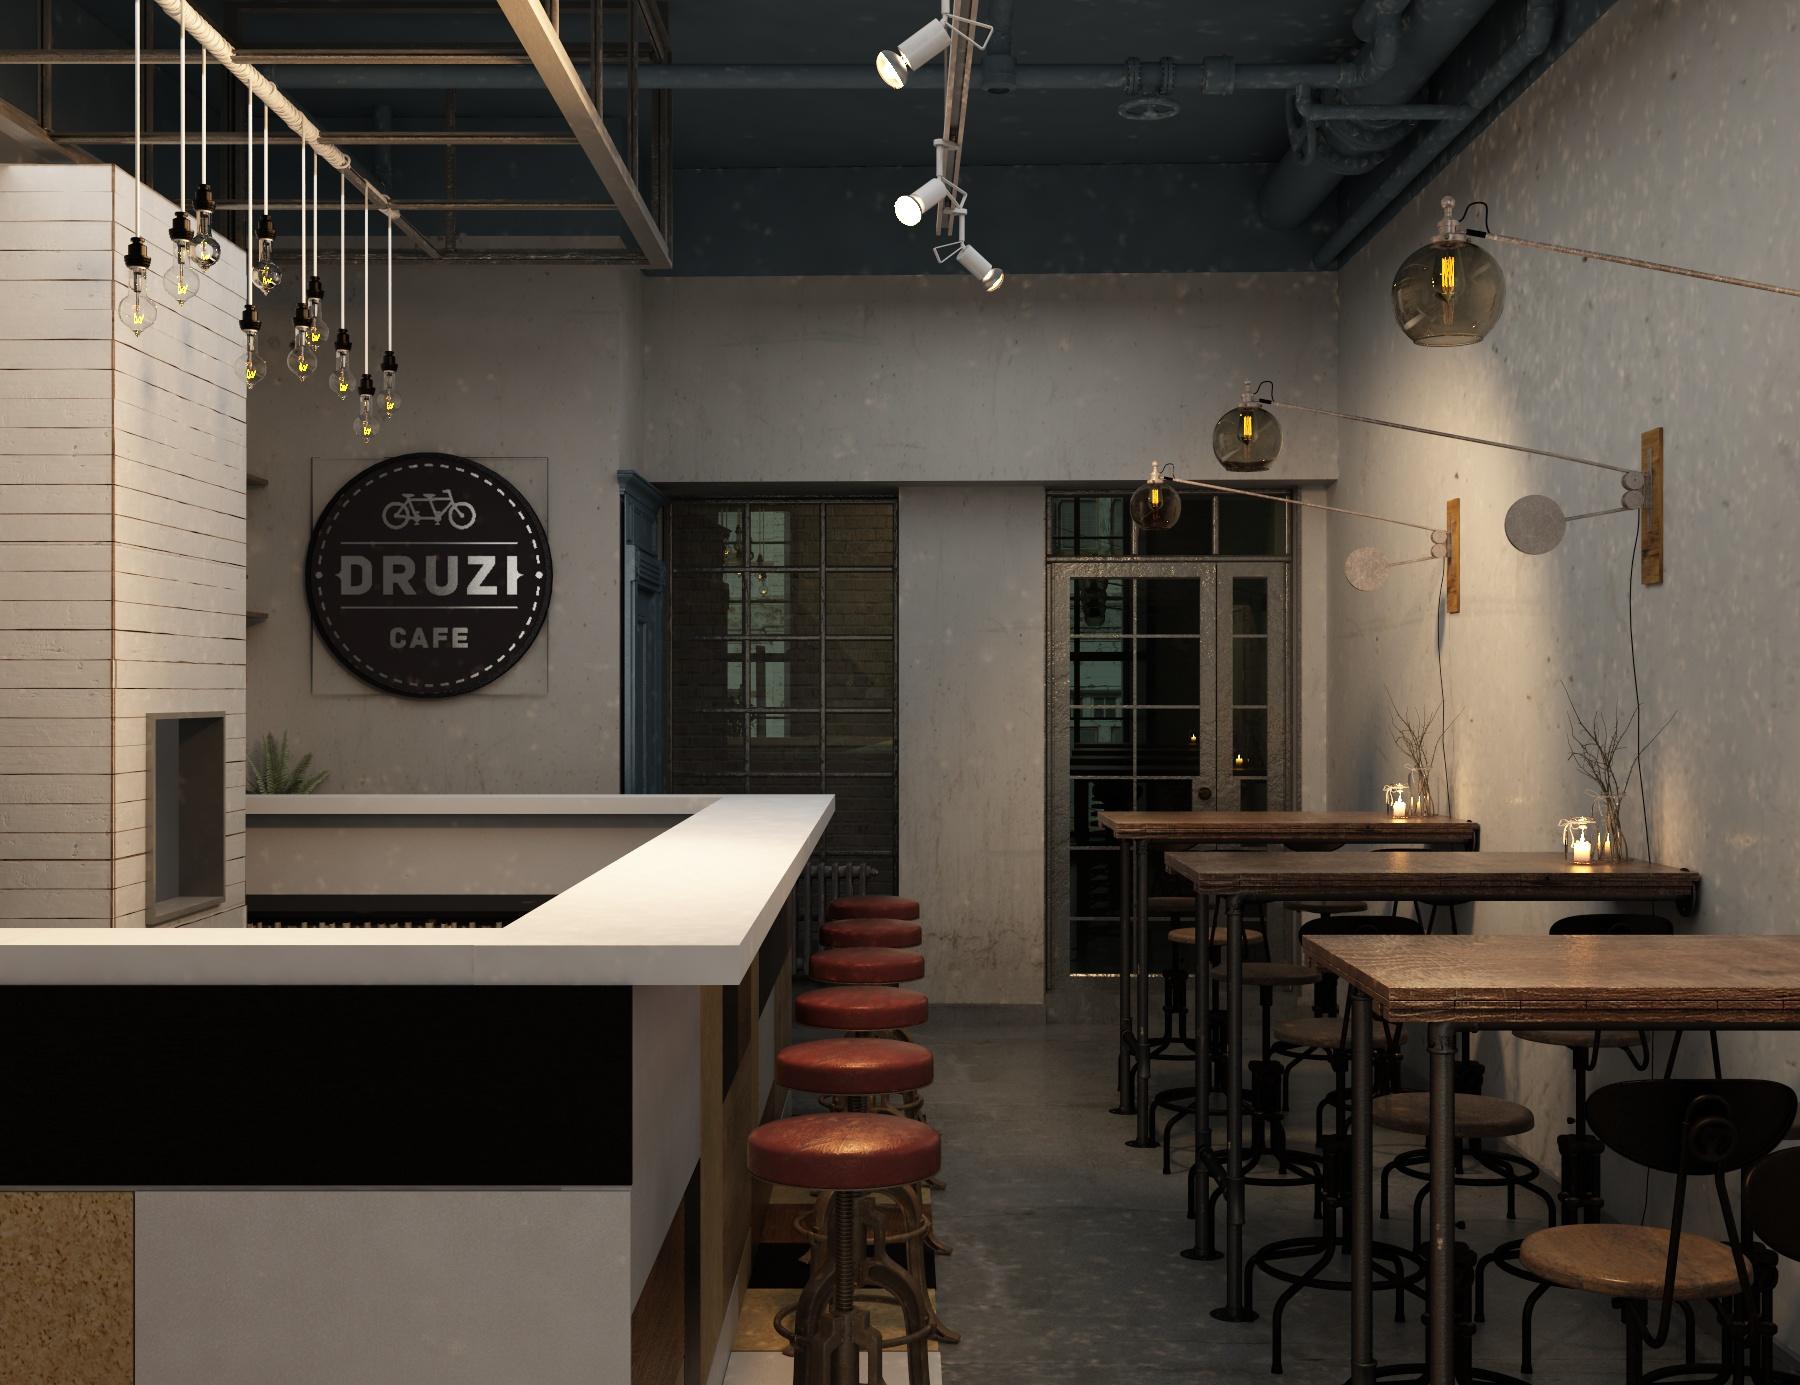 Druzi Cafe Львів